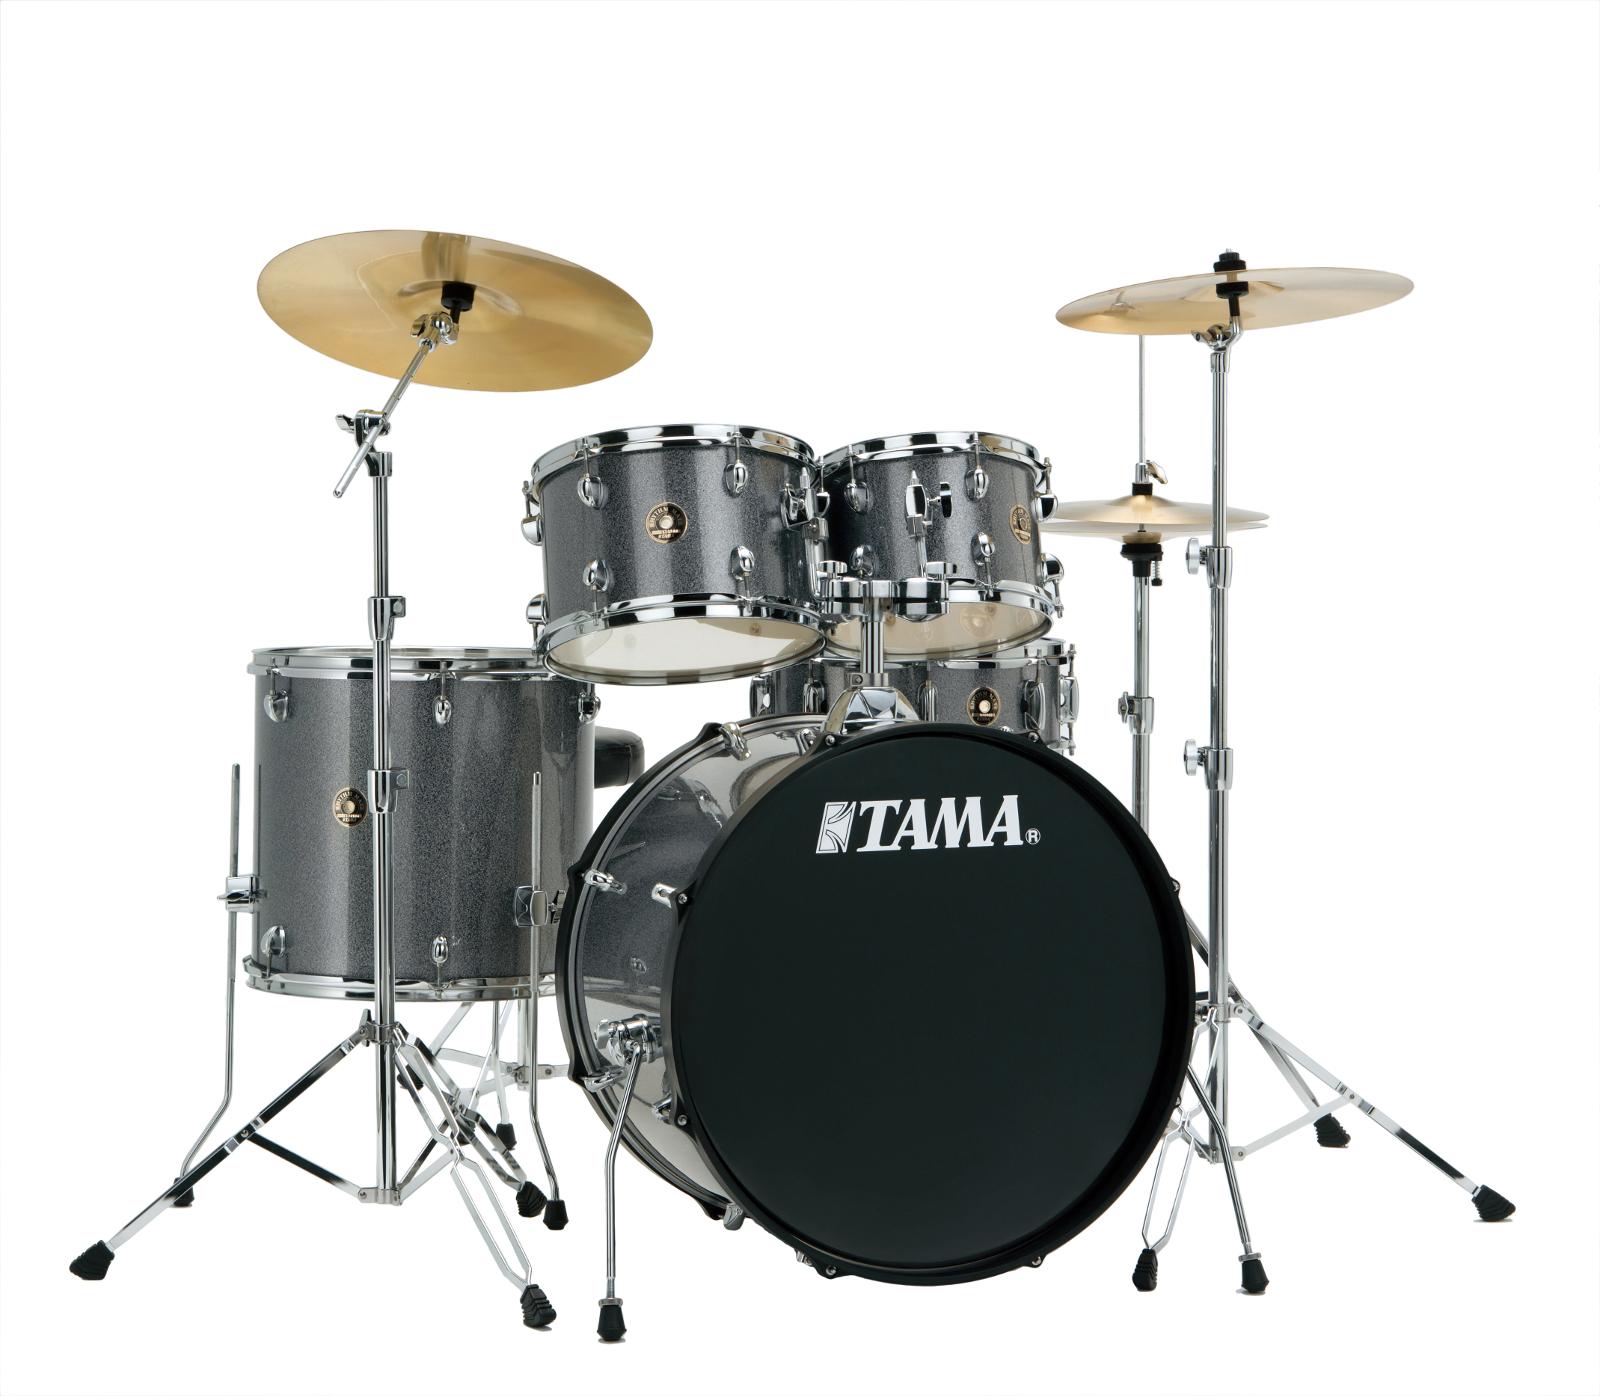 Tama Rm50yh6c-gxs - Rhythm Mate 5 Futs 20/10/12/14 Avec Hardware Et Cymbales...